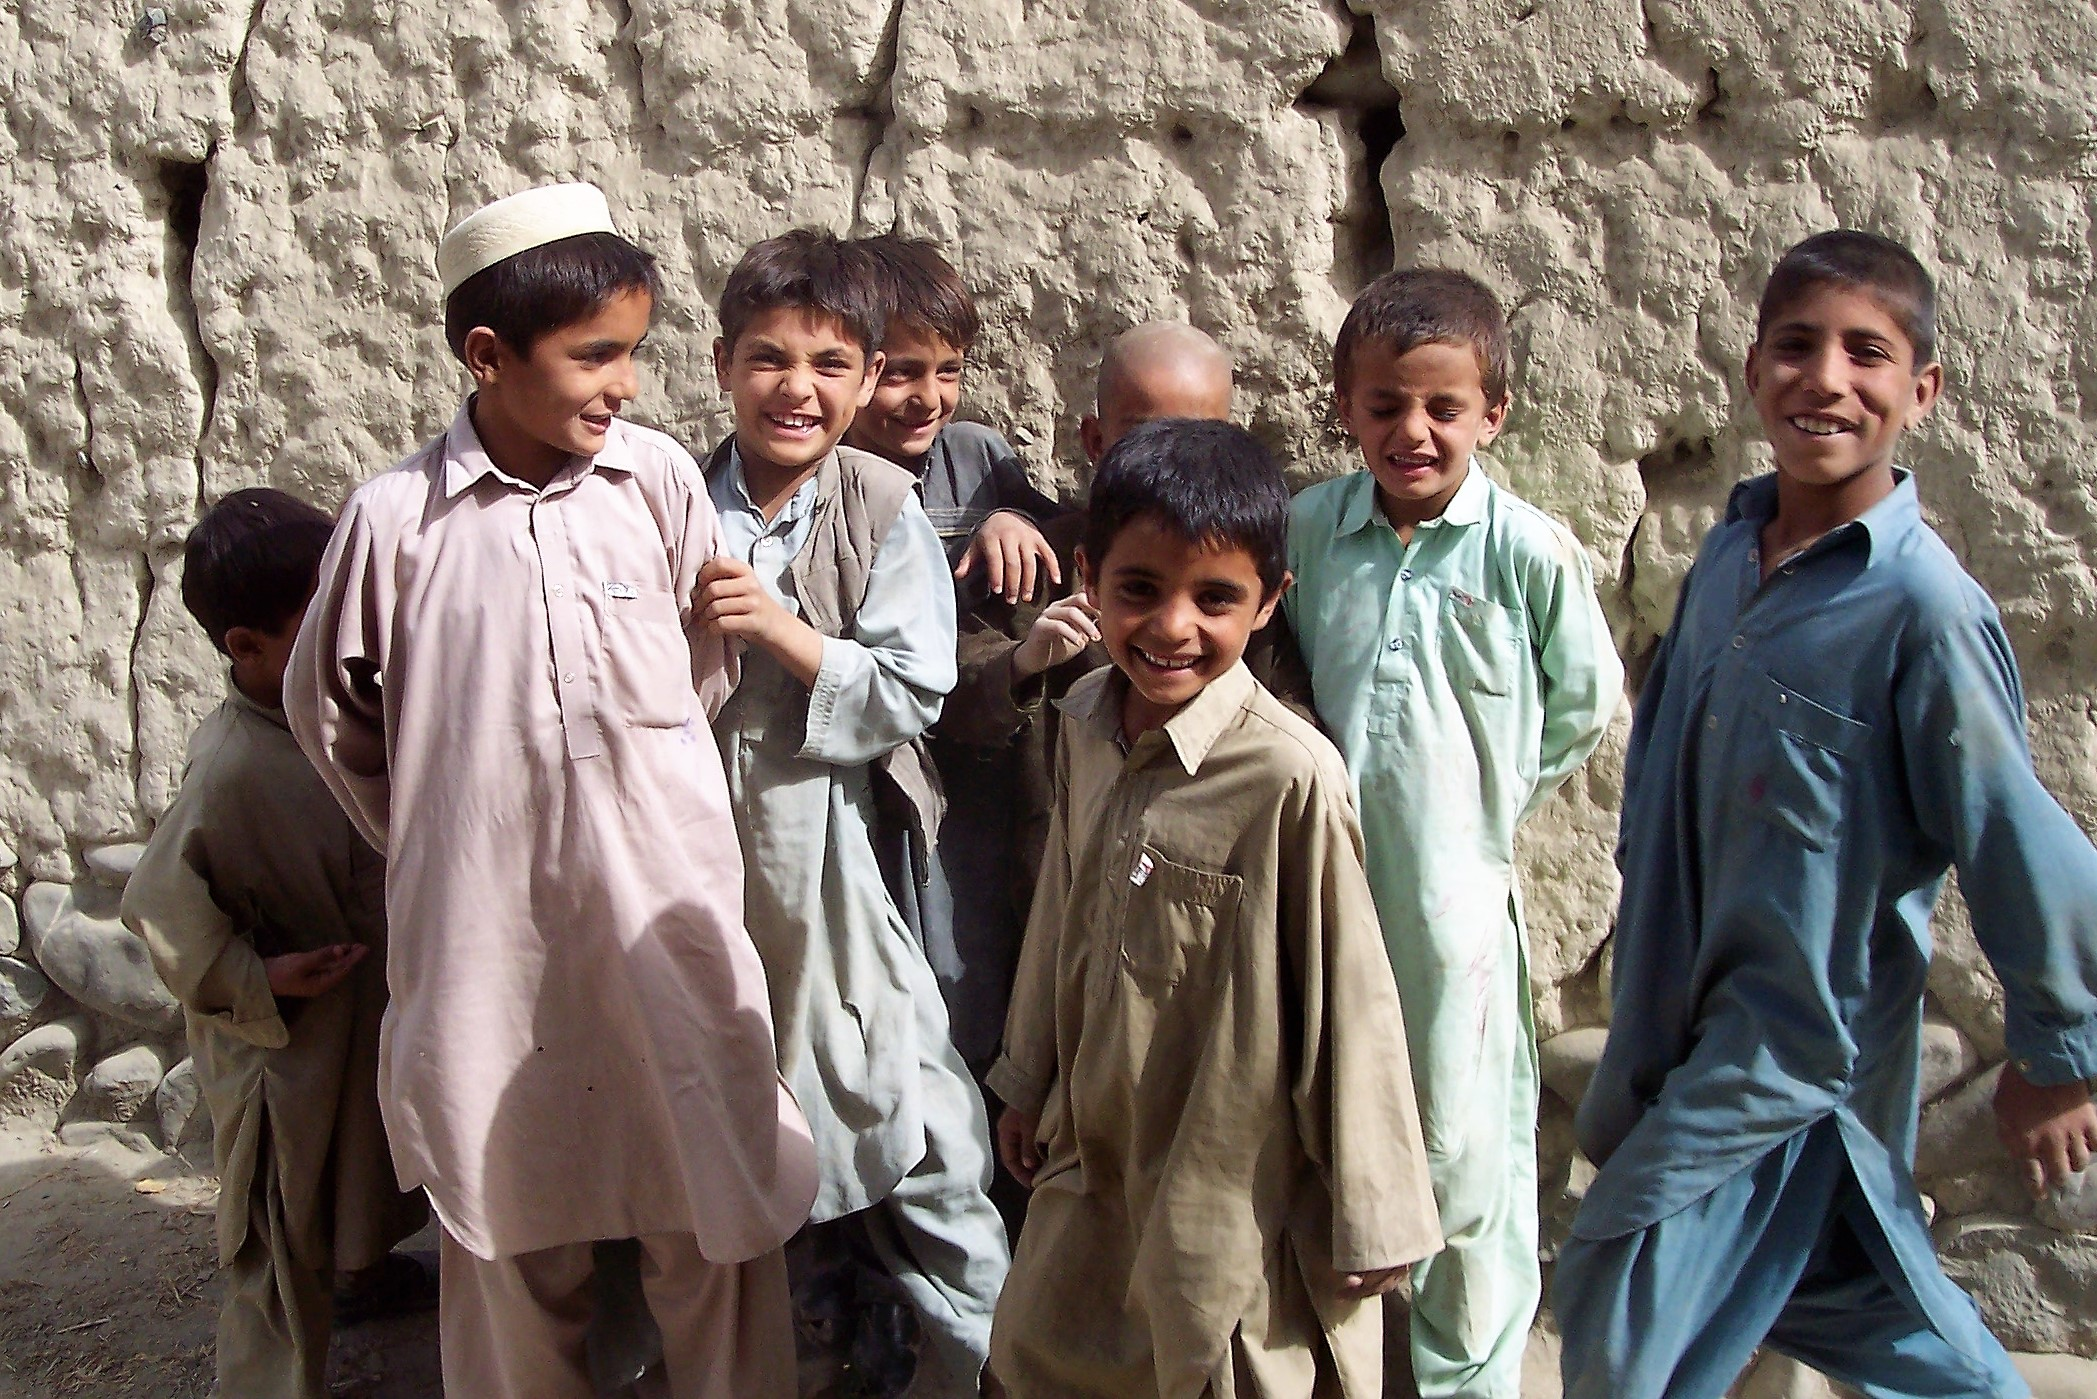 Afghan Boys 2.JPG